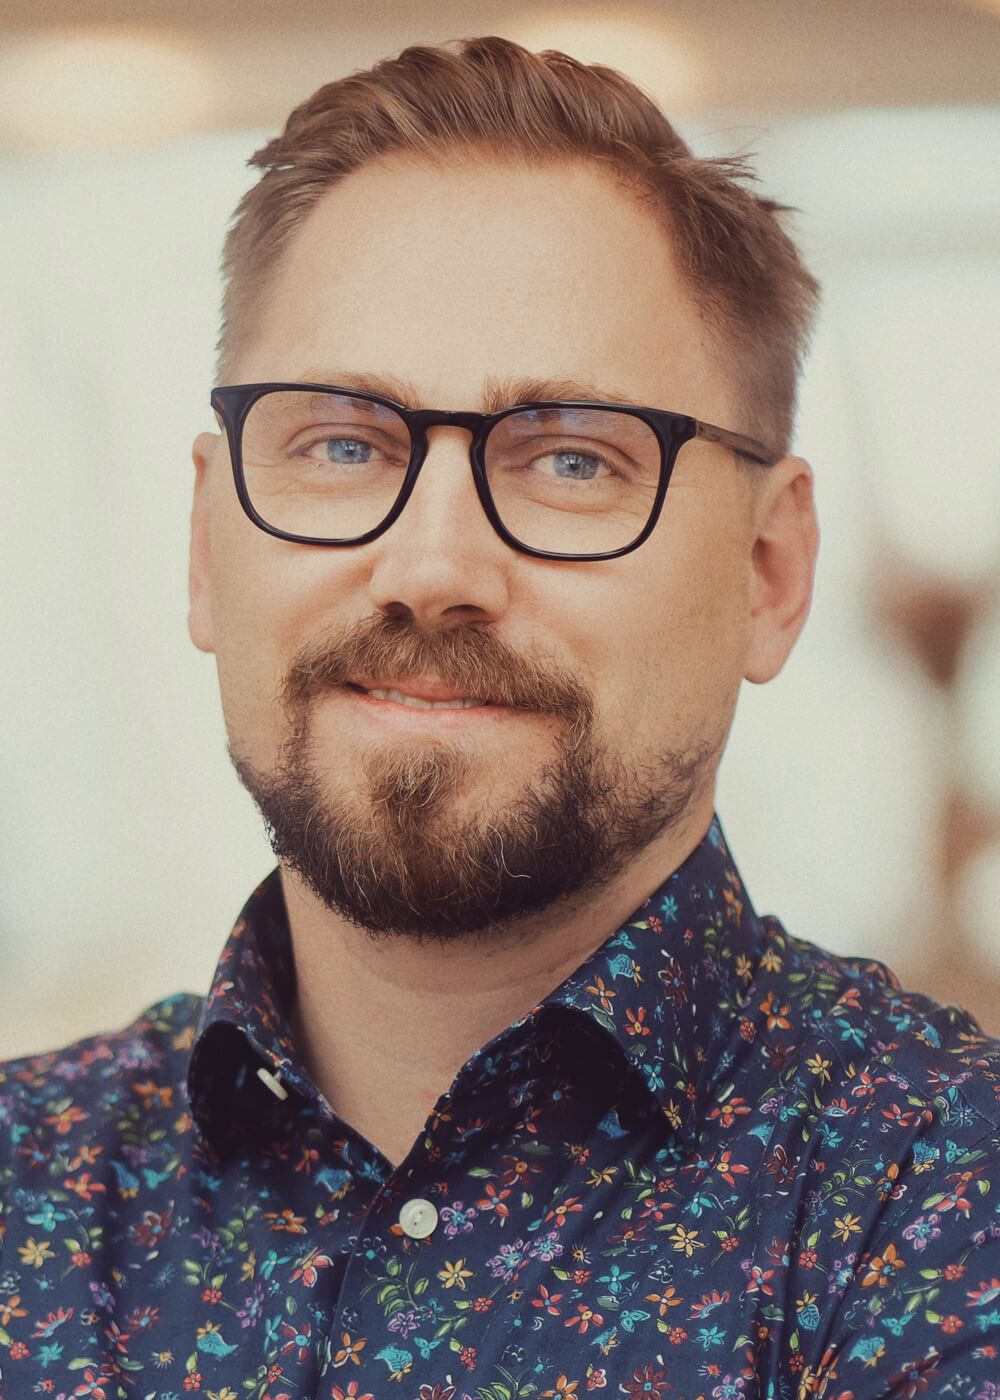 portrait-5×7-12-Emil_Eriksson11nov